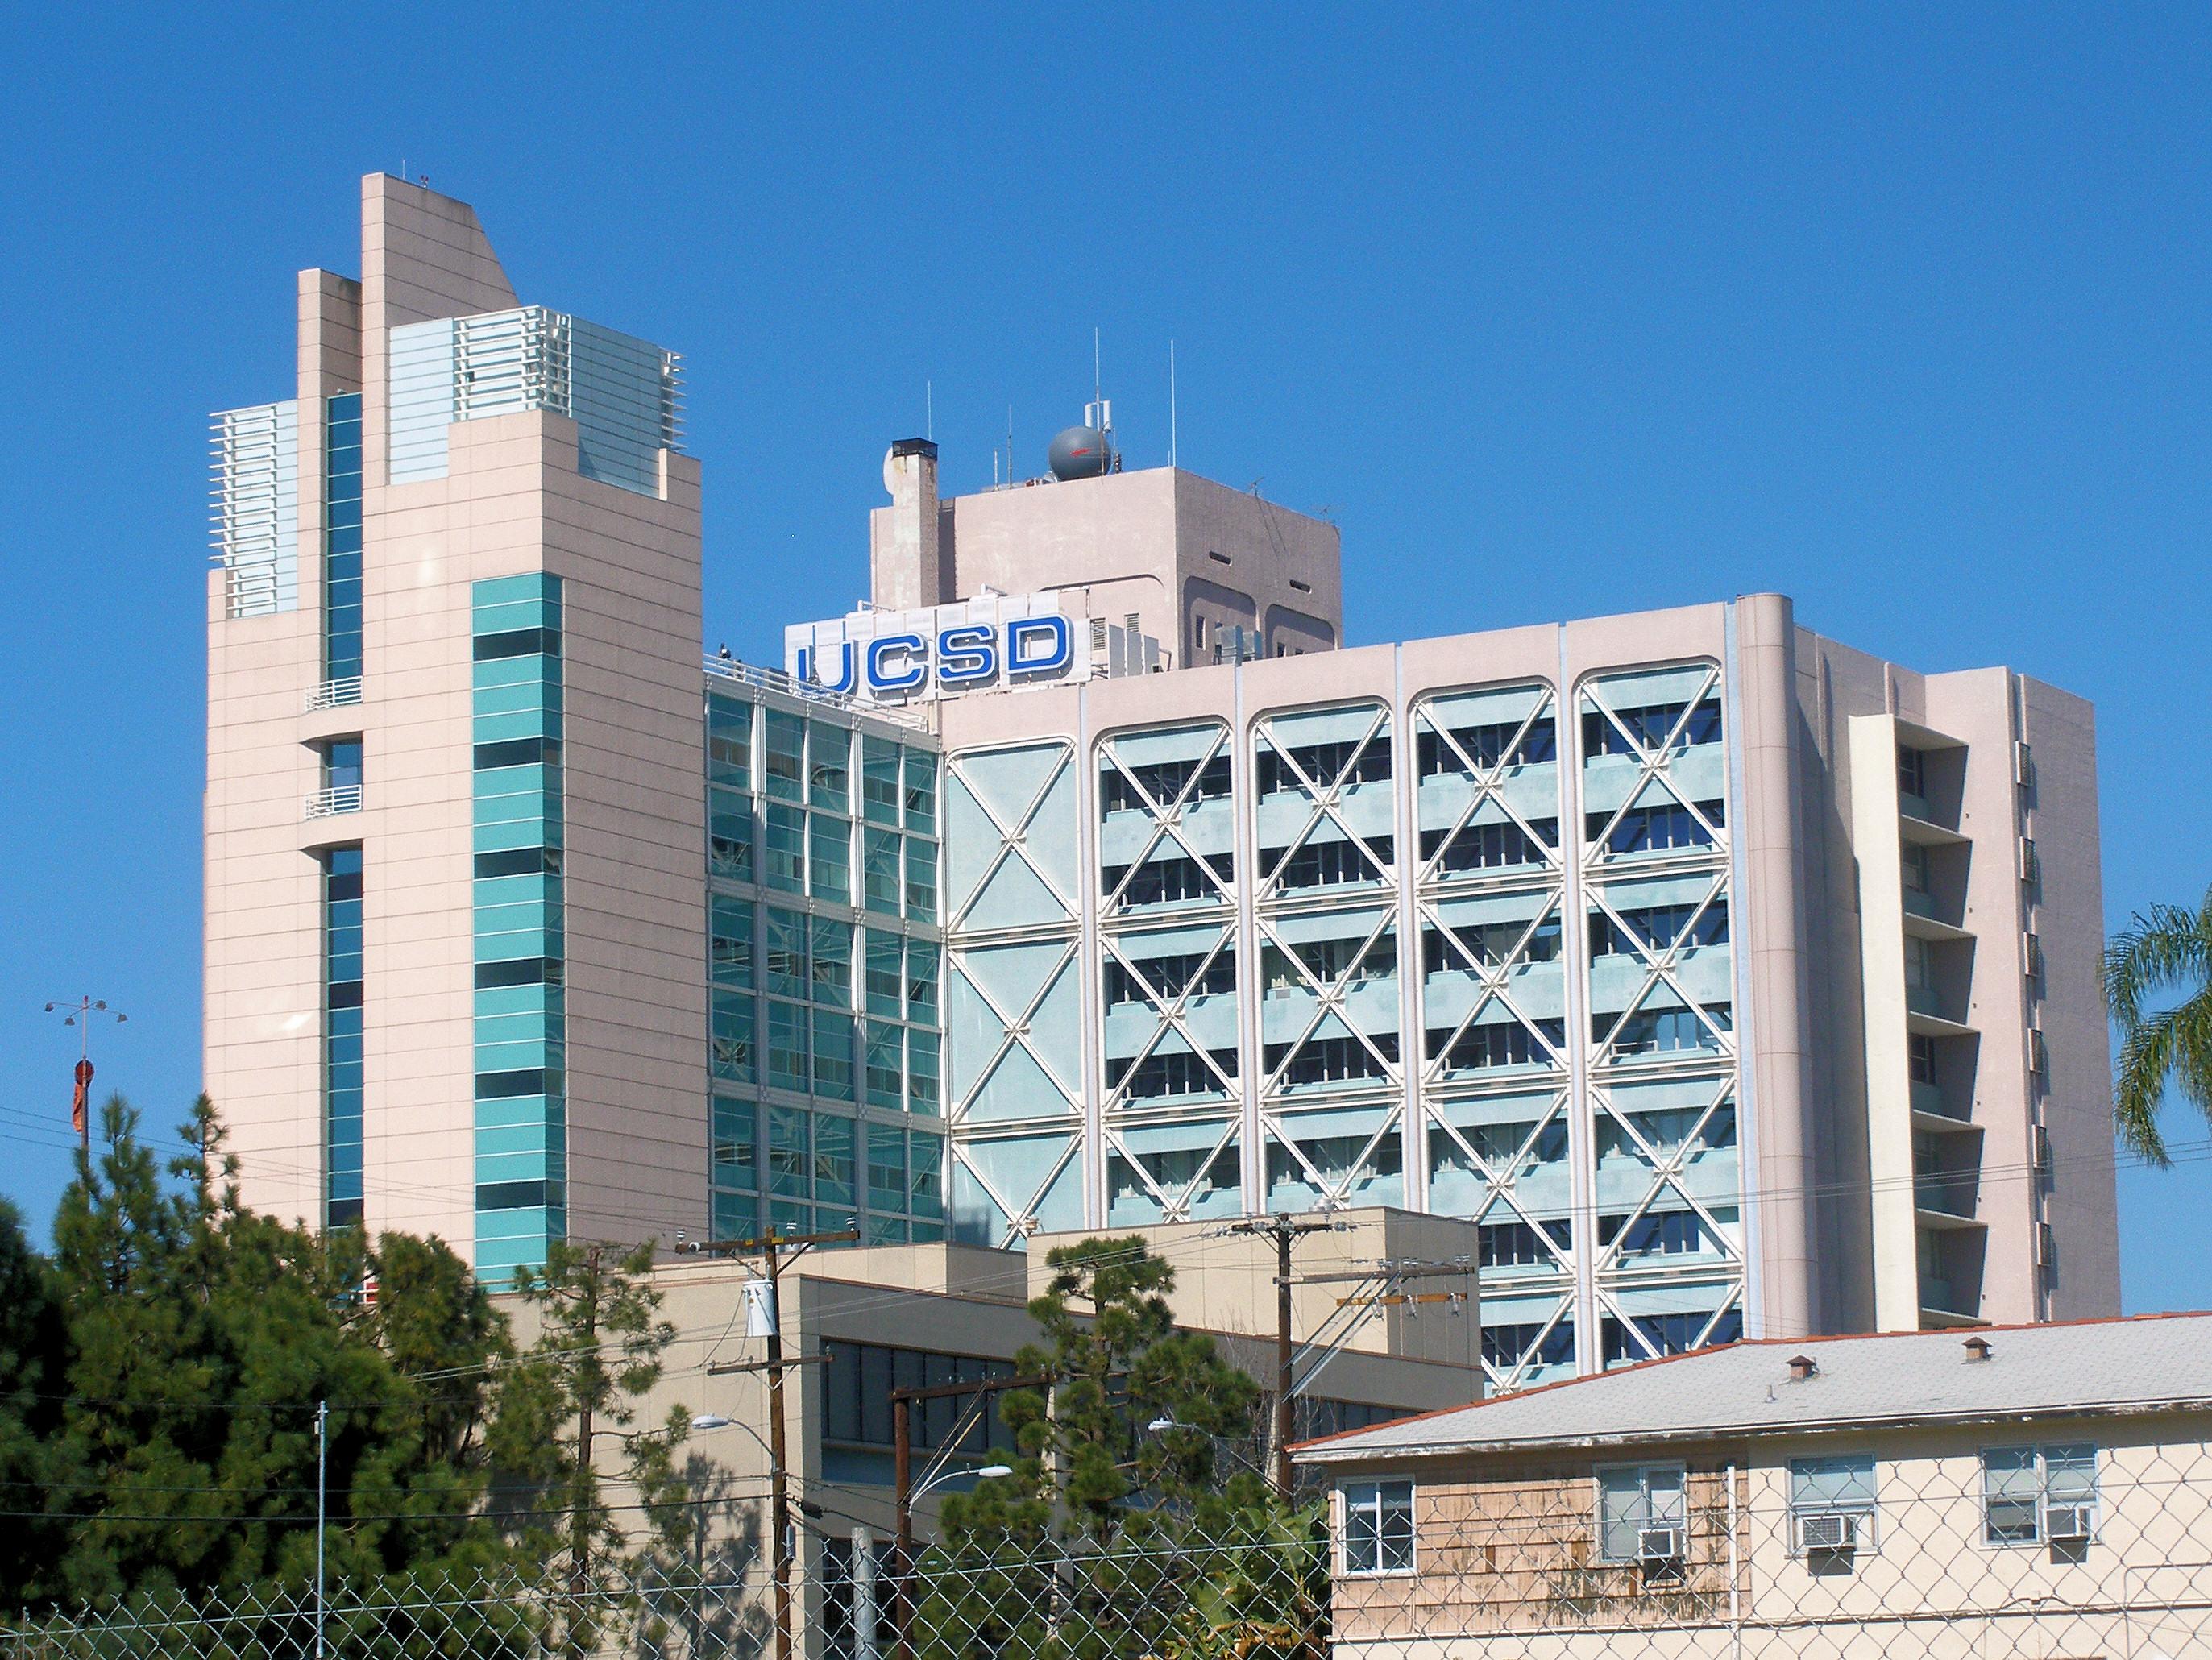 UCSD_Medical_Center_Hillcrest